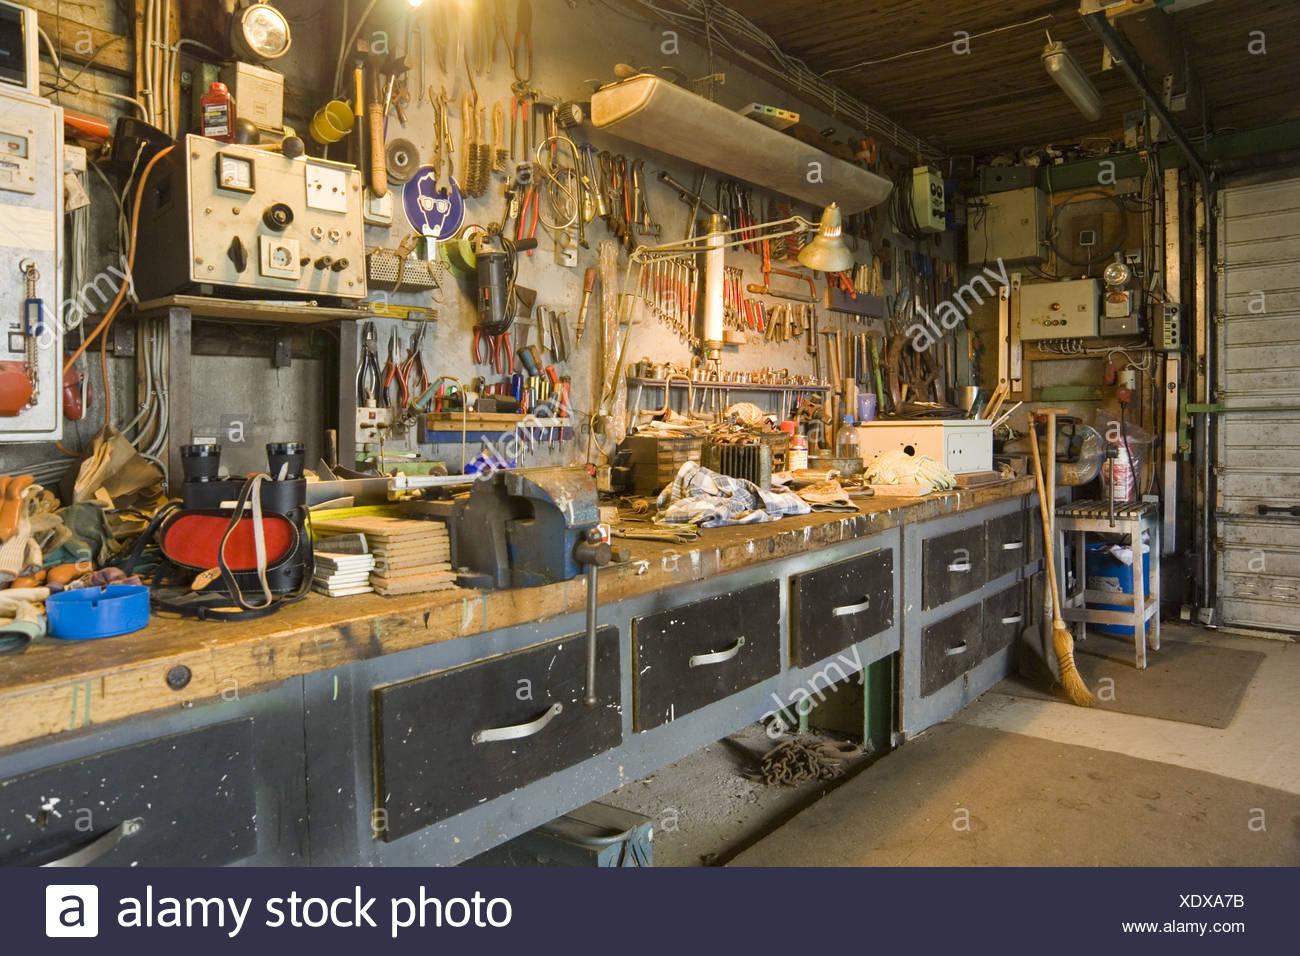 Interior Garage Hobby Workshop Stock Photo Alamy